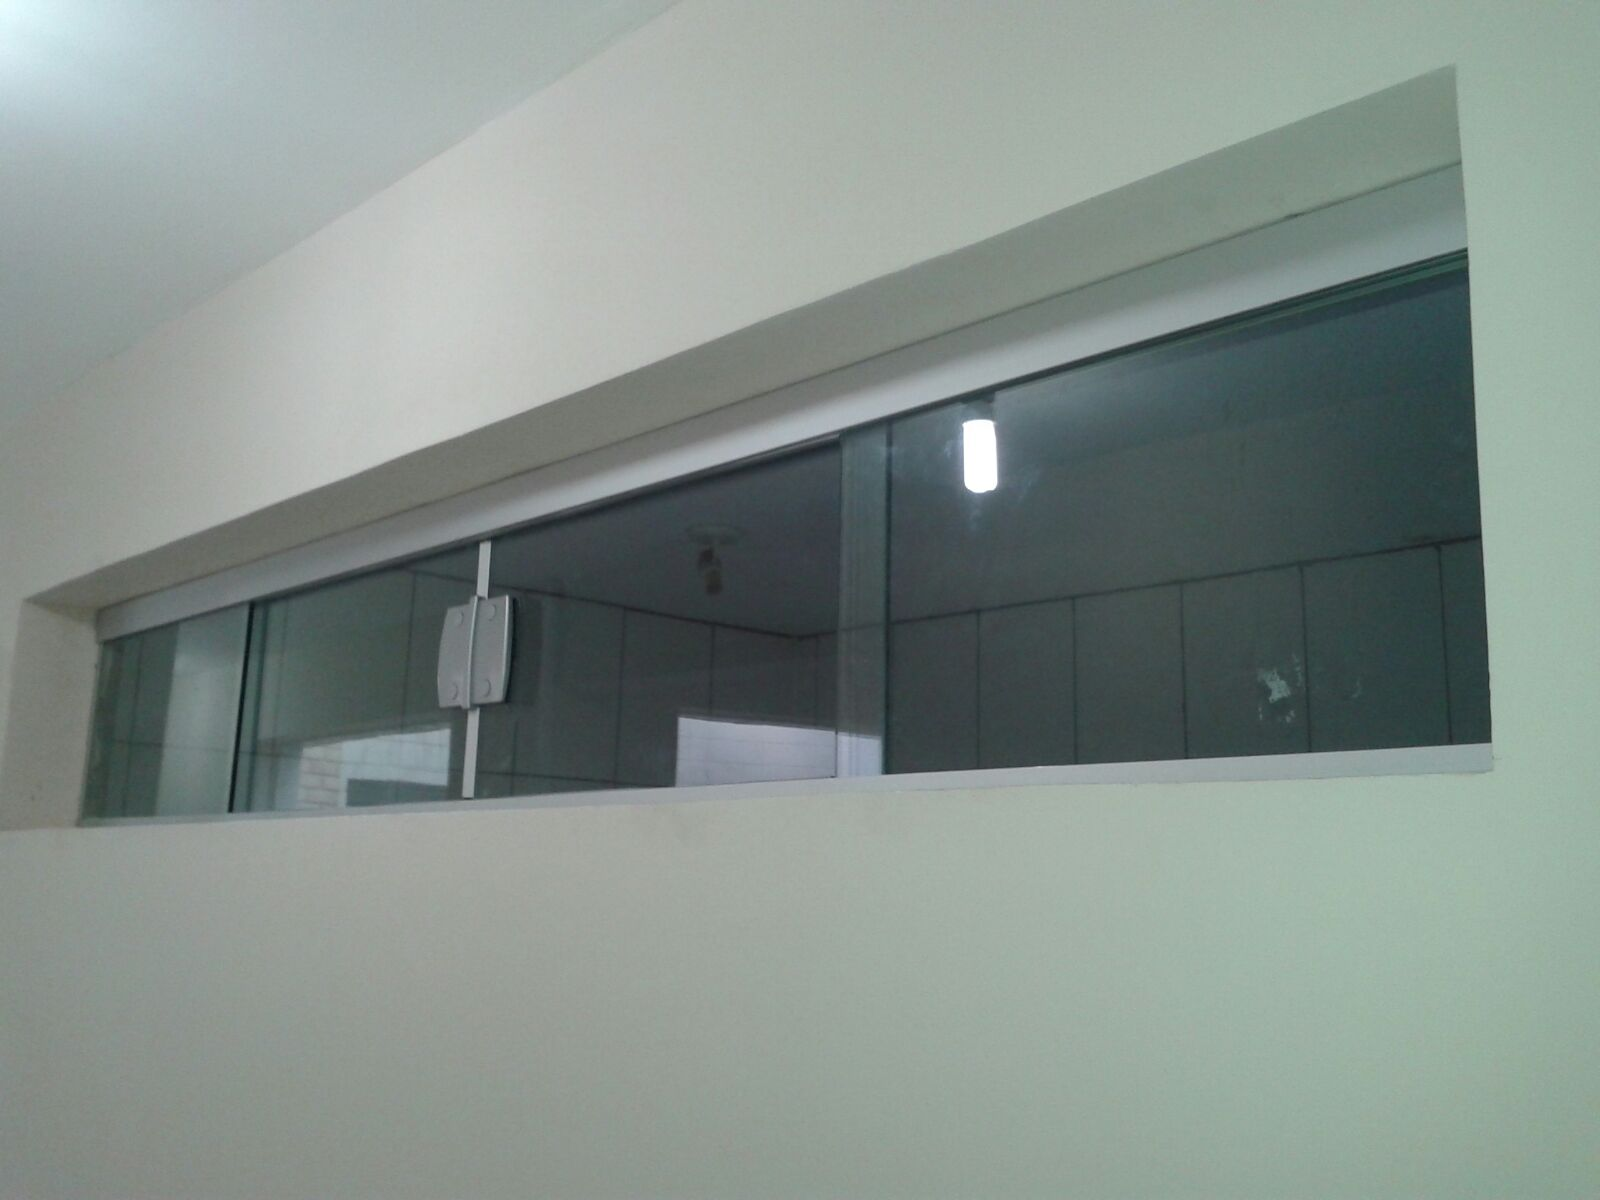 #455357 Janela de vidro temperado incolor com fechadura condomínio JK 116 Janelas De Vidro Em Sao Luis Ma